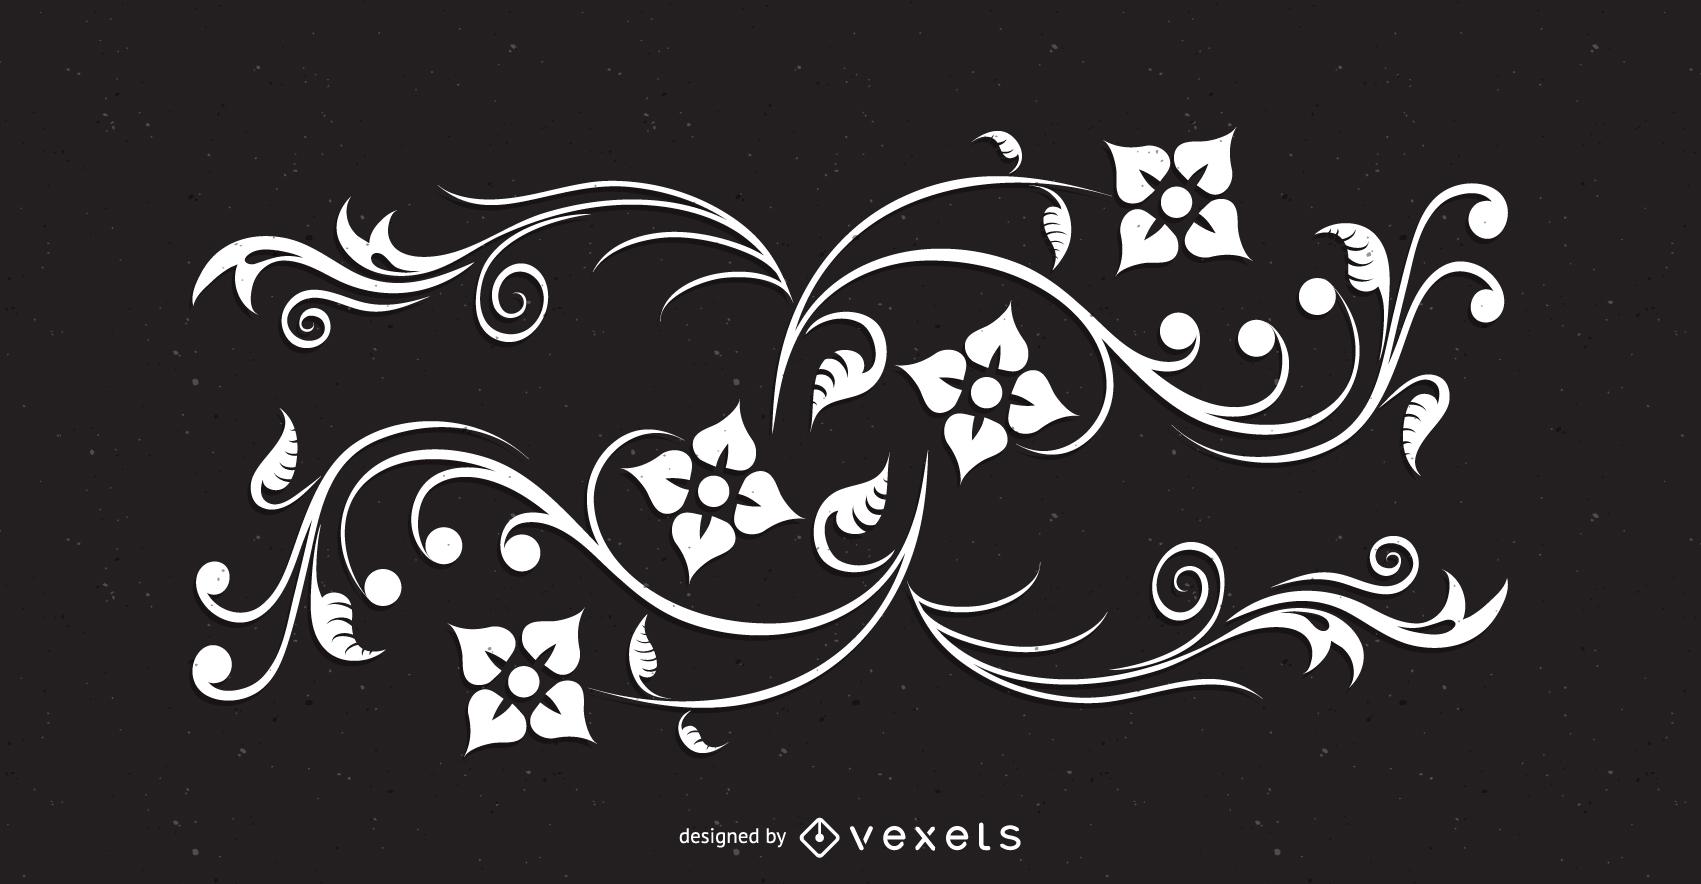 Abstract floral swirls illustration